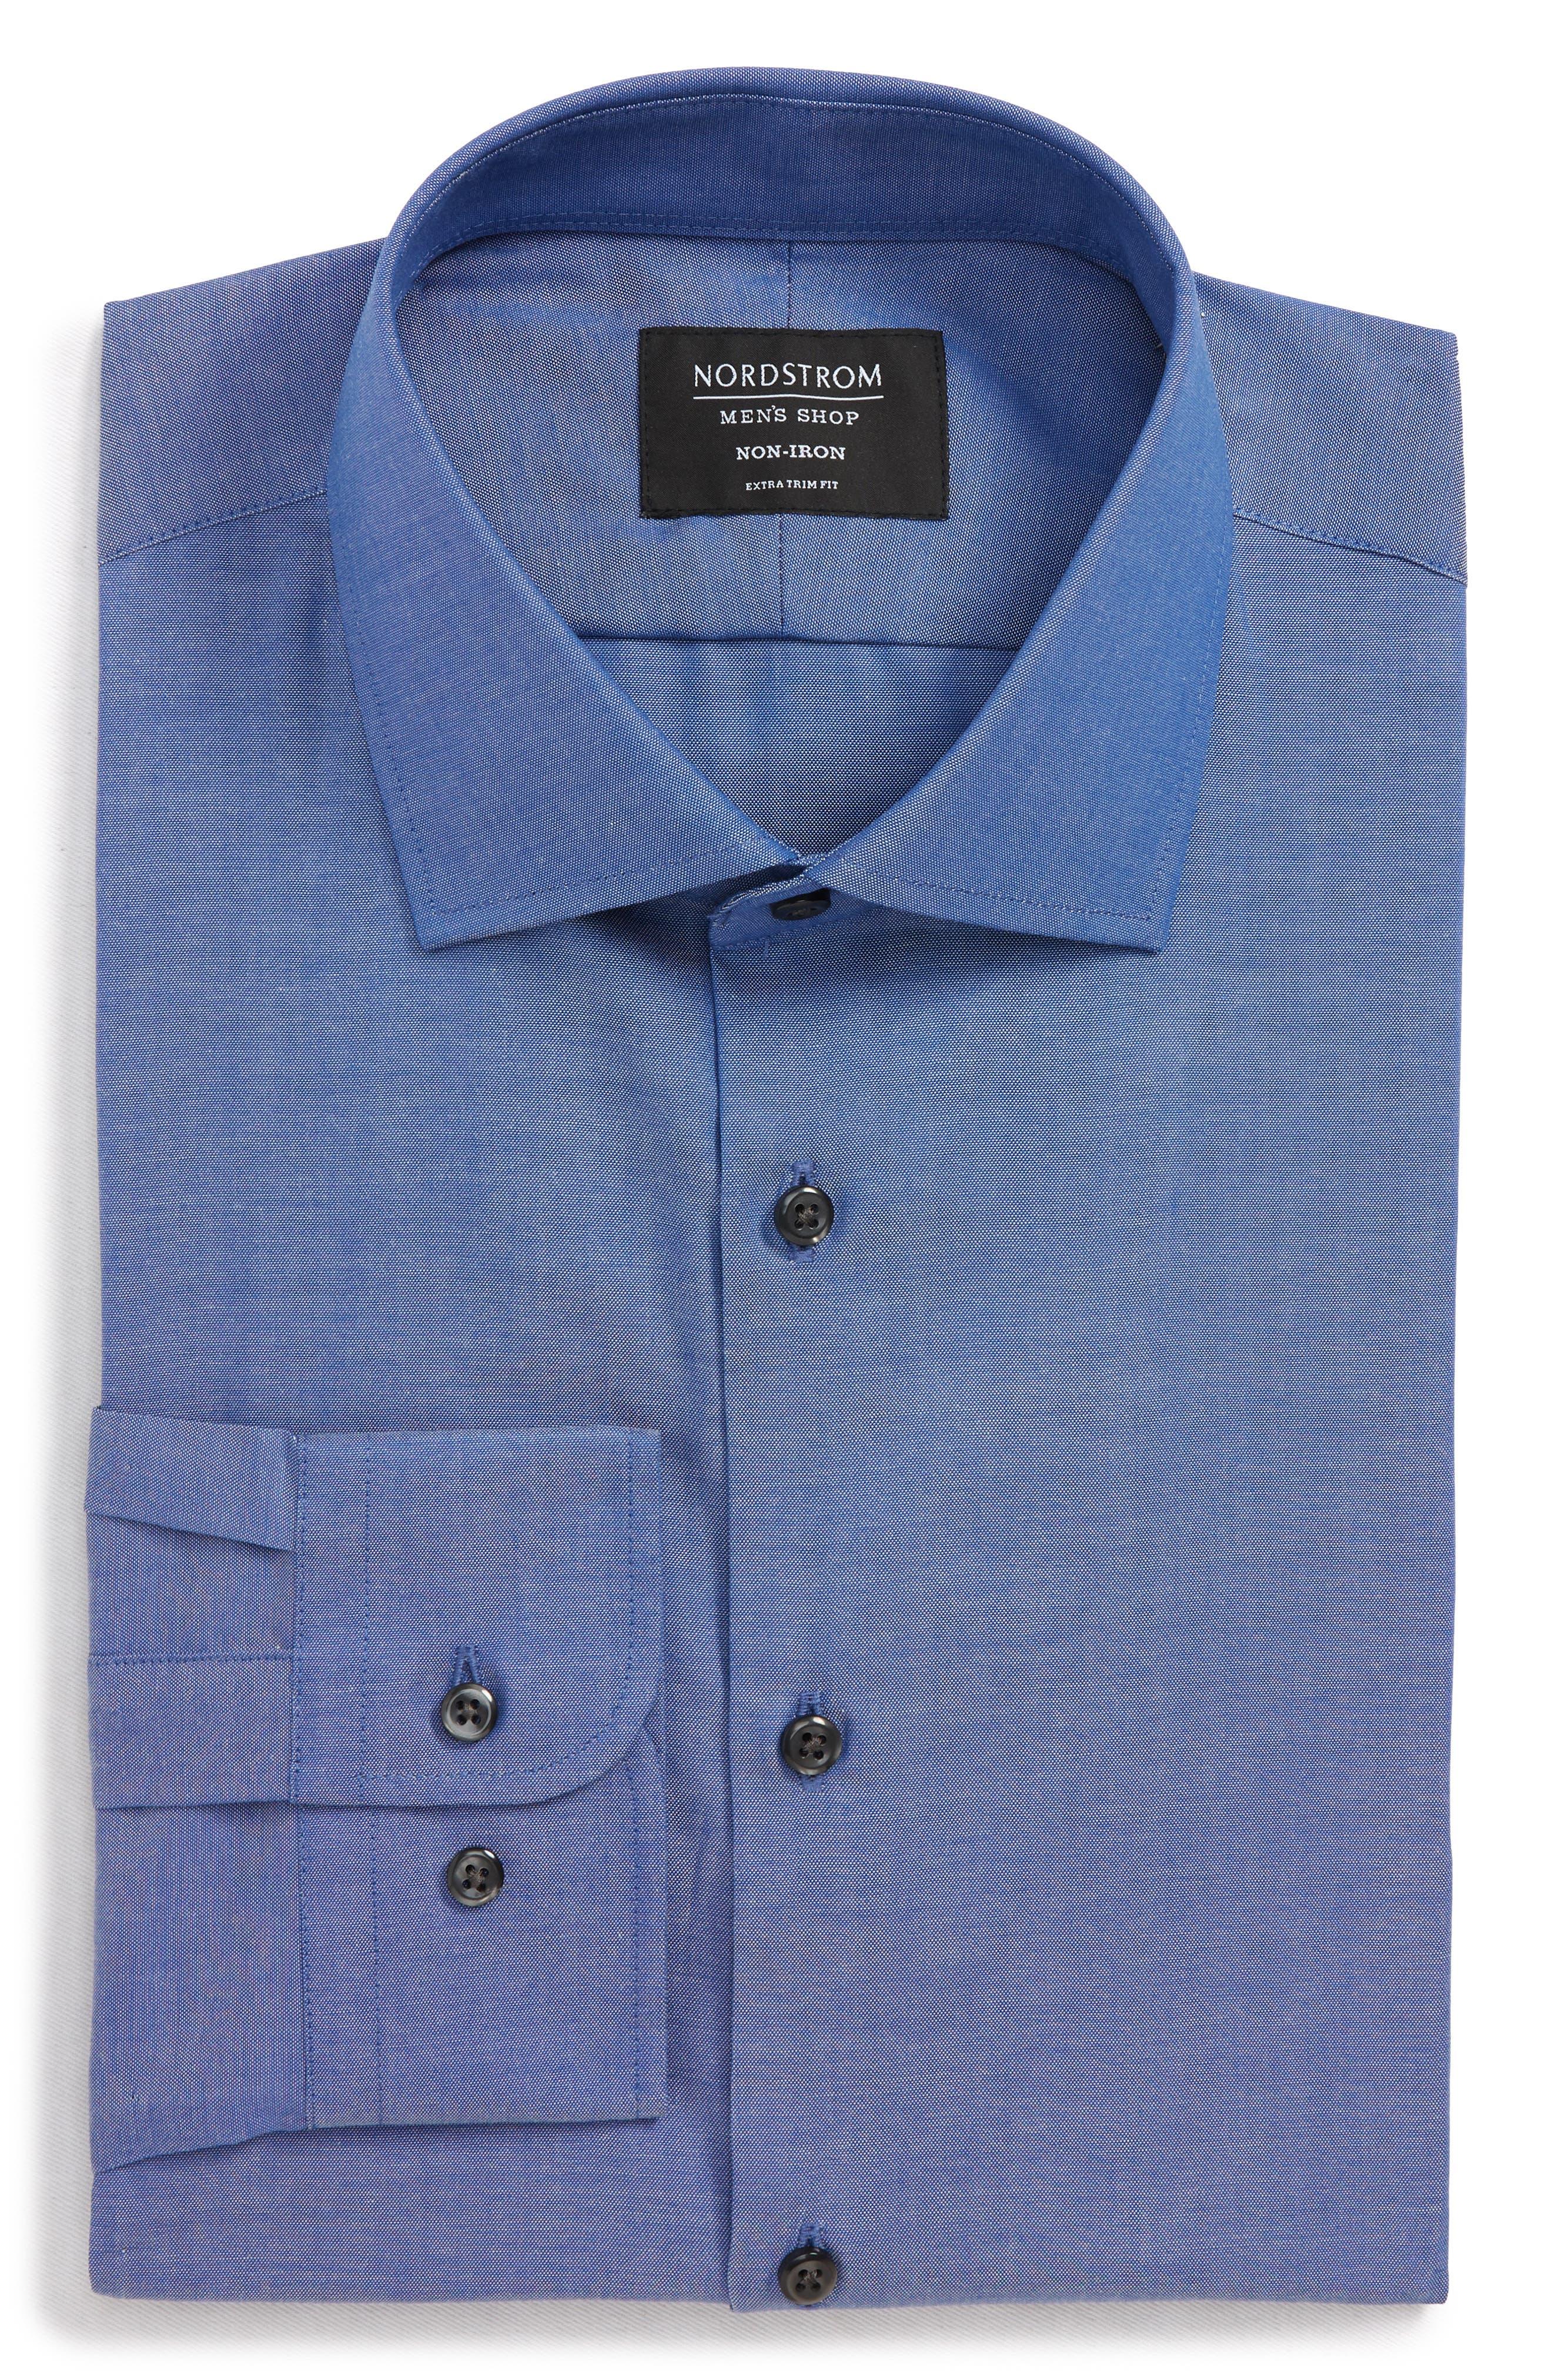 Extra Trim Fit Non-Iron Solid Dress Shirt,                             Alternate thumbnail 5, color,                             BLUE DENIM